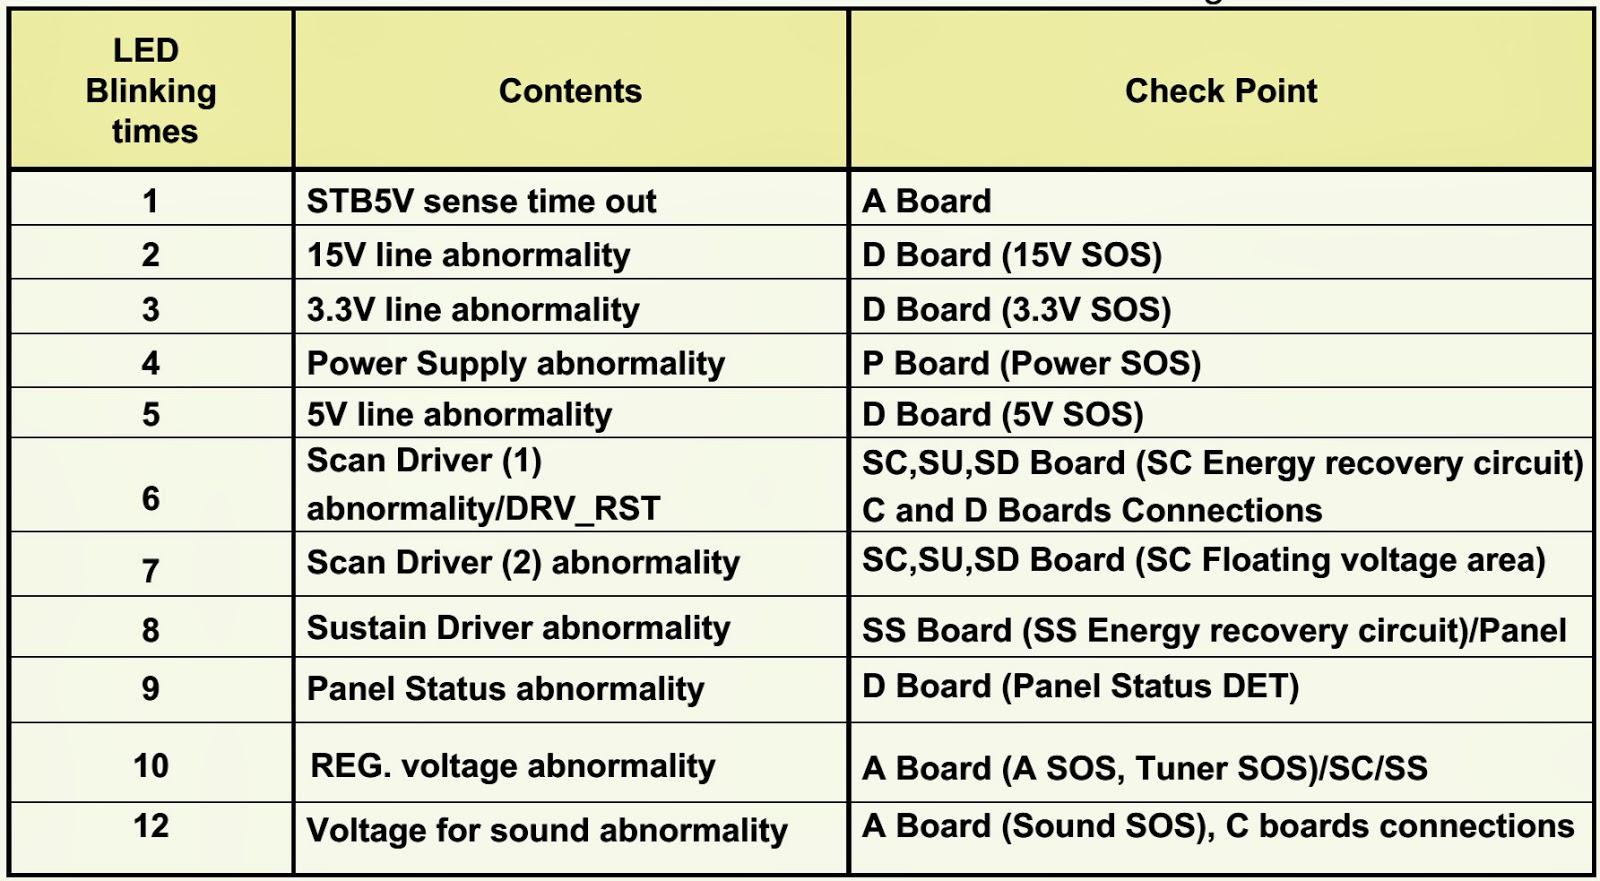 Panasonic Plasma Tv Led Blinking Codes Troubleshooting Electro Circuit With Schematics And Explanation